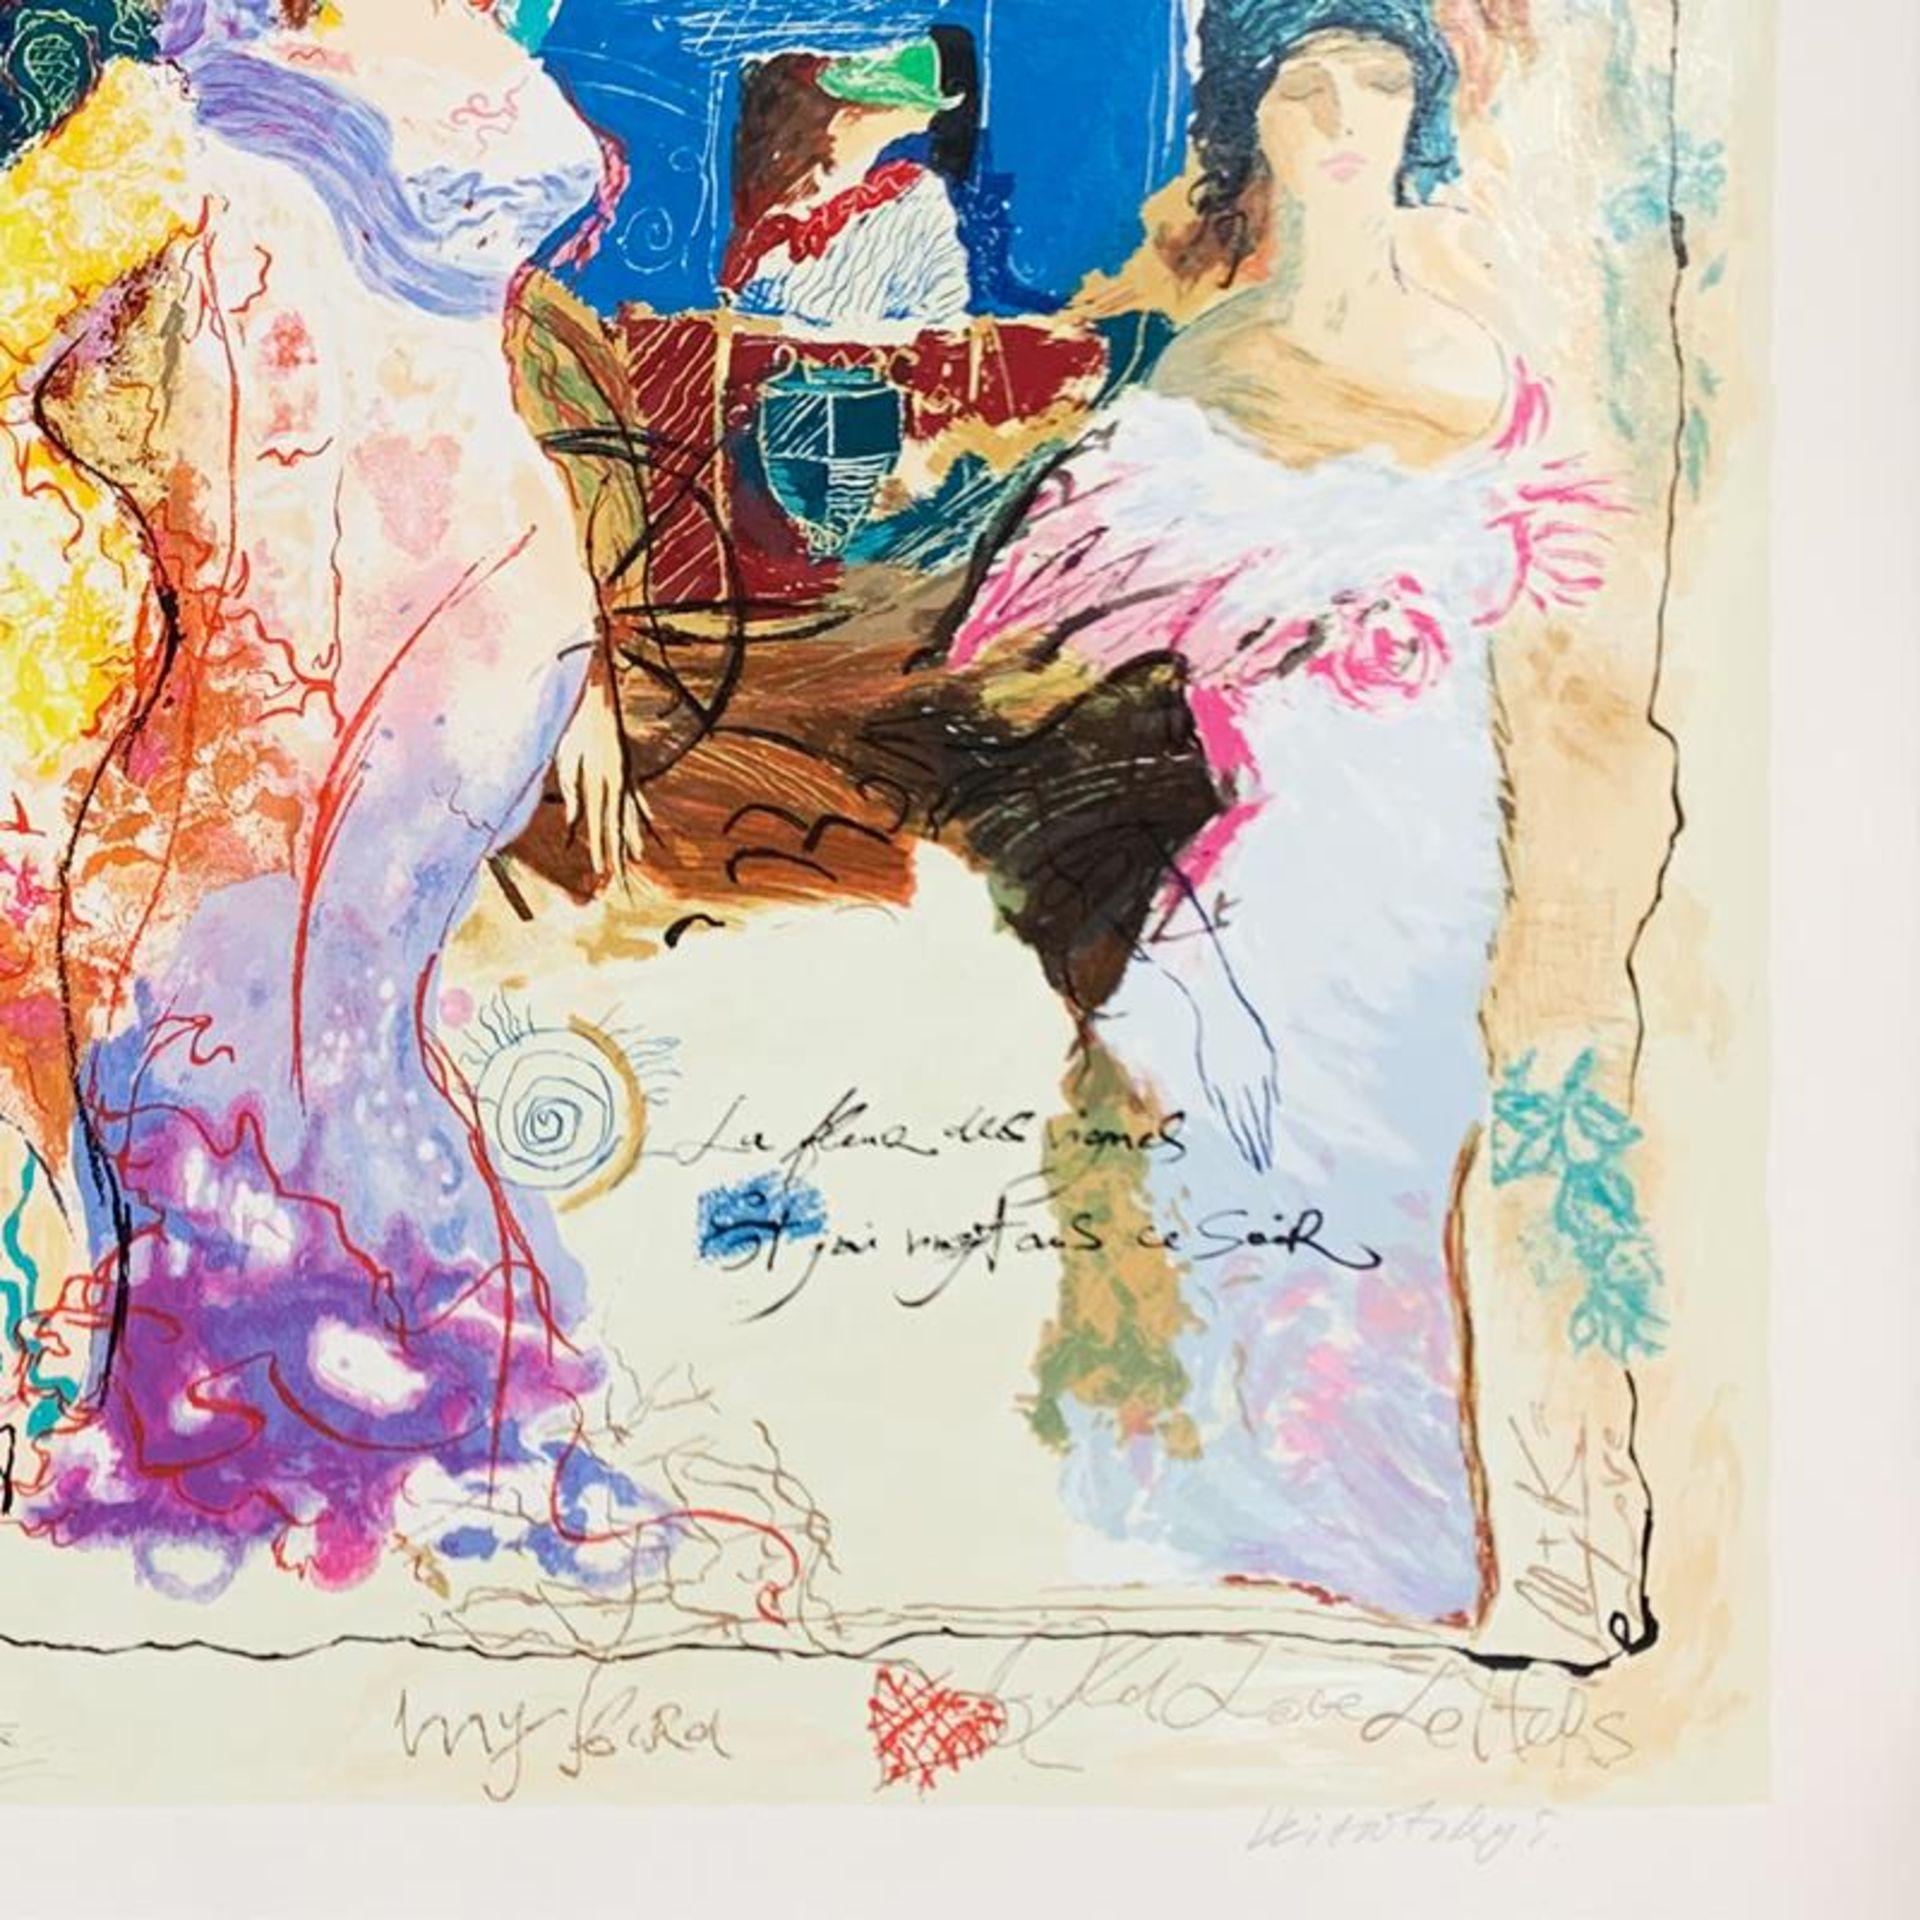 Alexander Galtchansky (1959-2008) and Tanya Wissotzky (1959-2006), Hand Signed L - Image 2 of 3